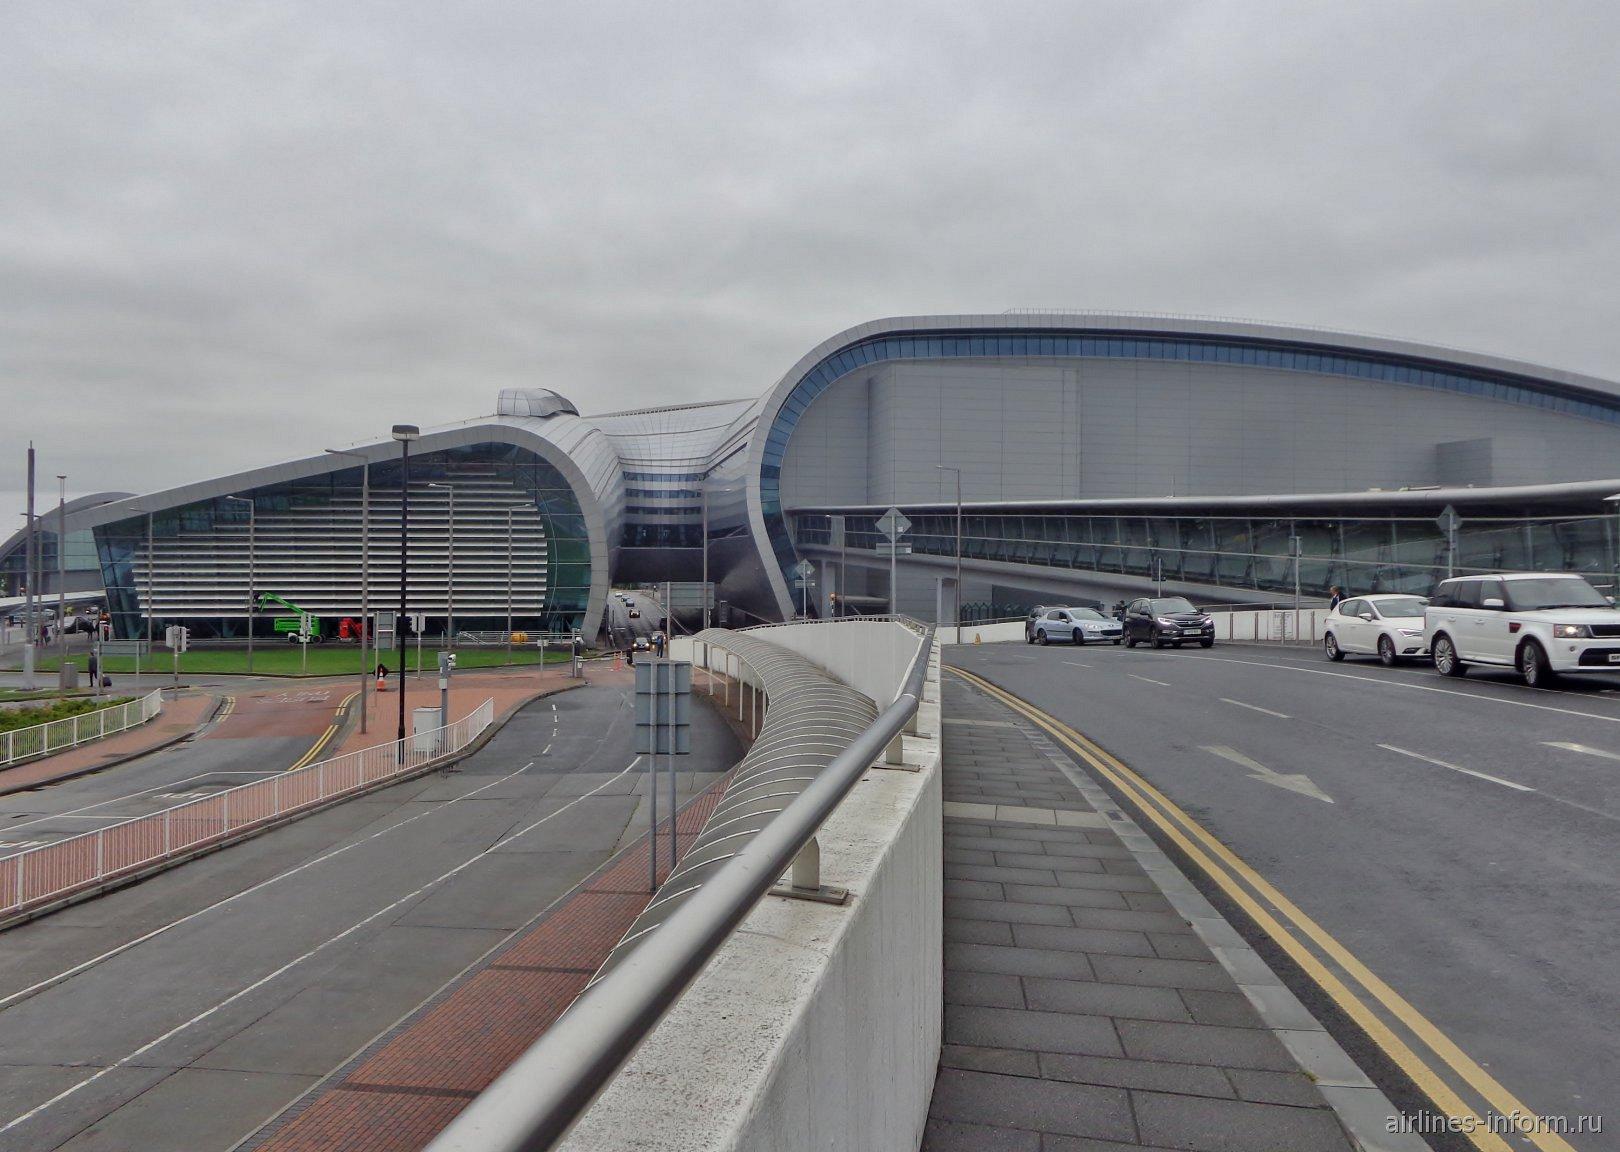 Терминал 2 аэропорта Дублин